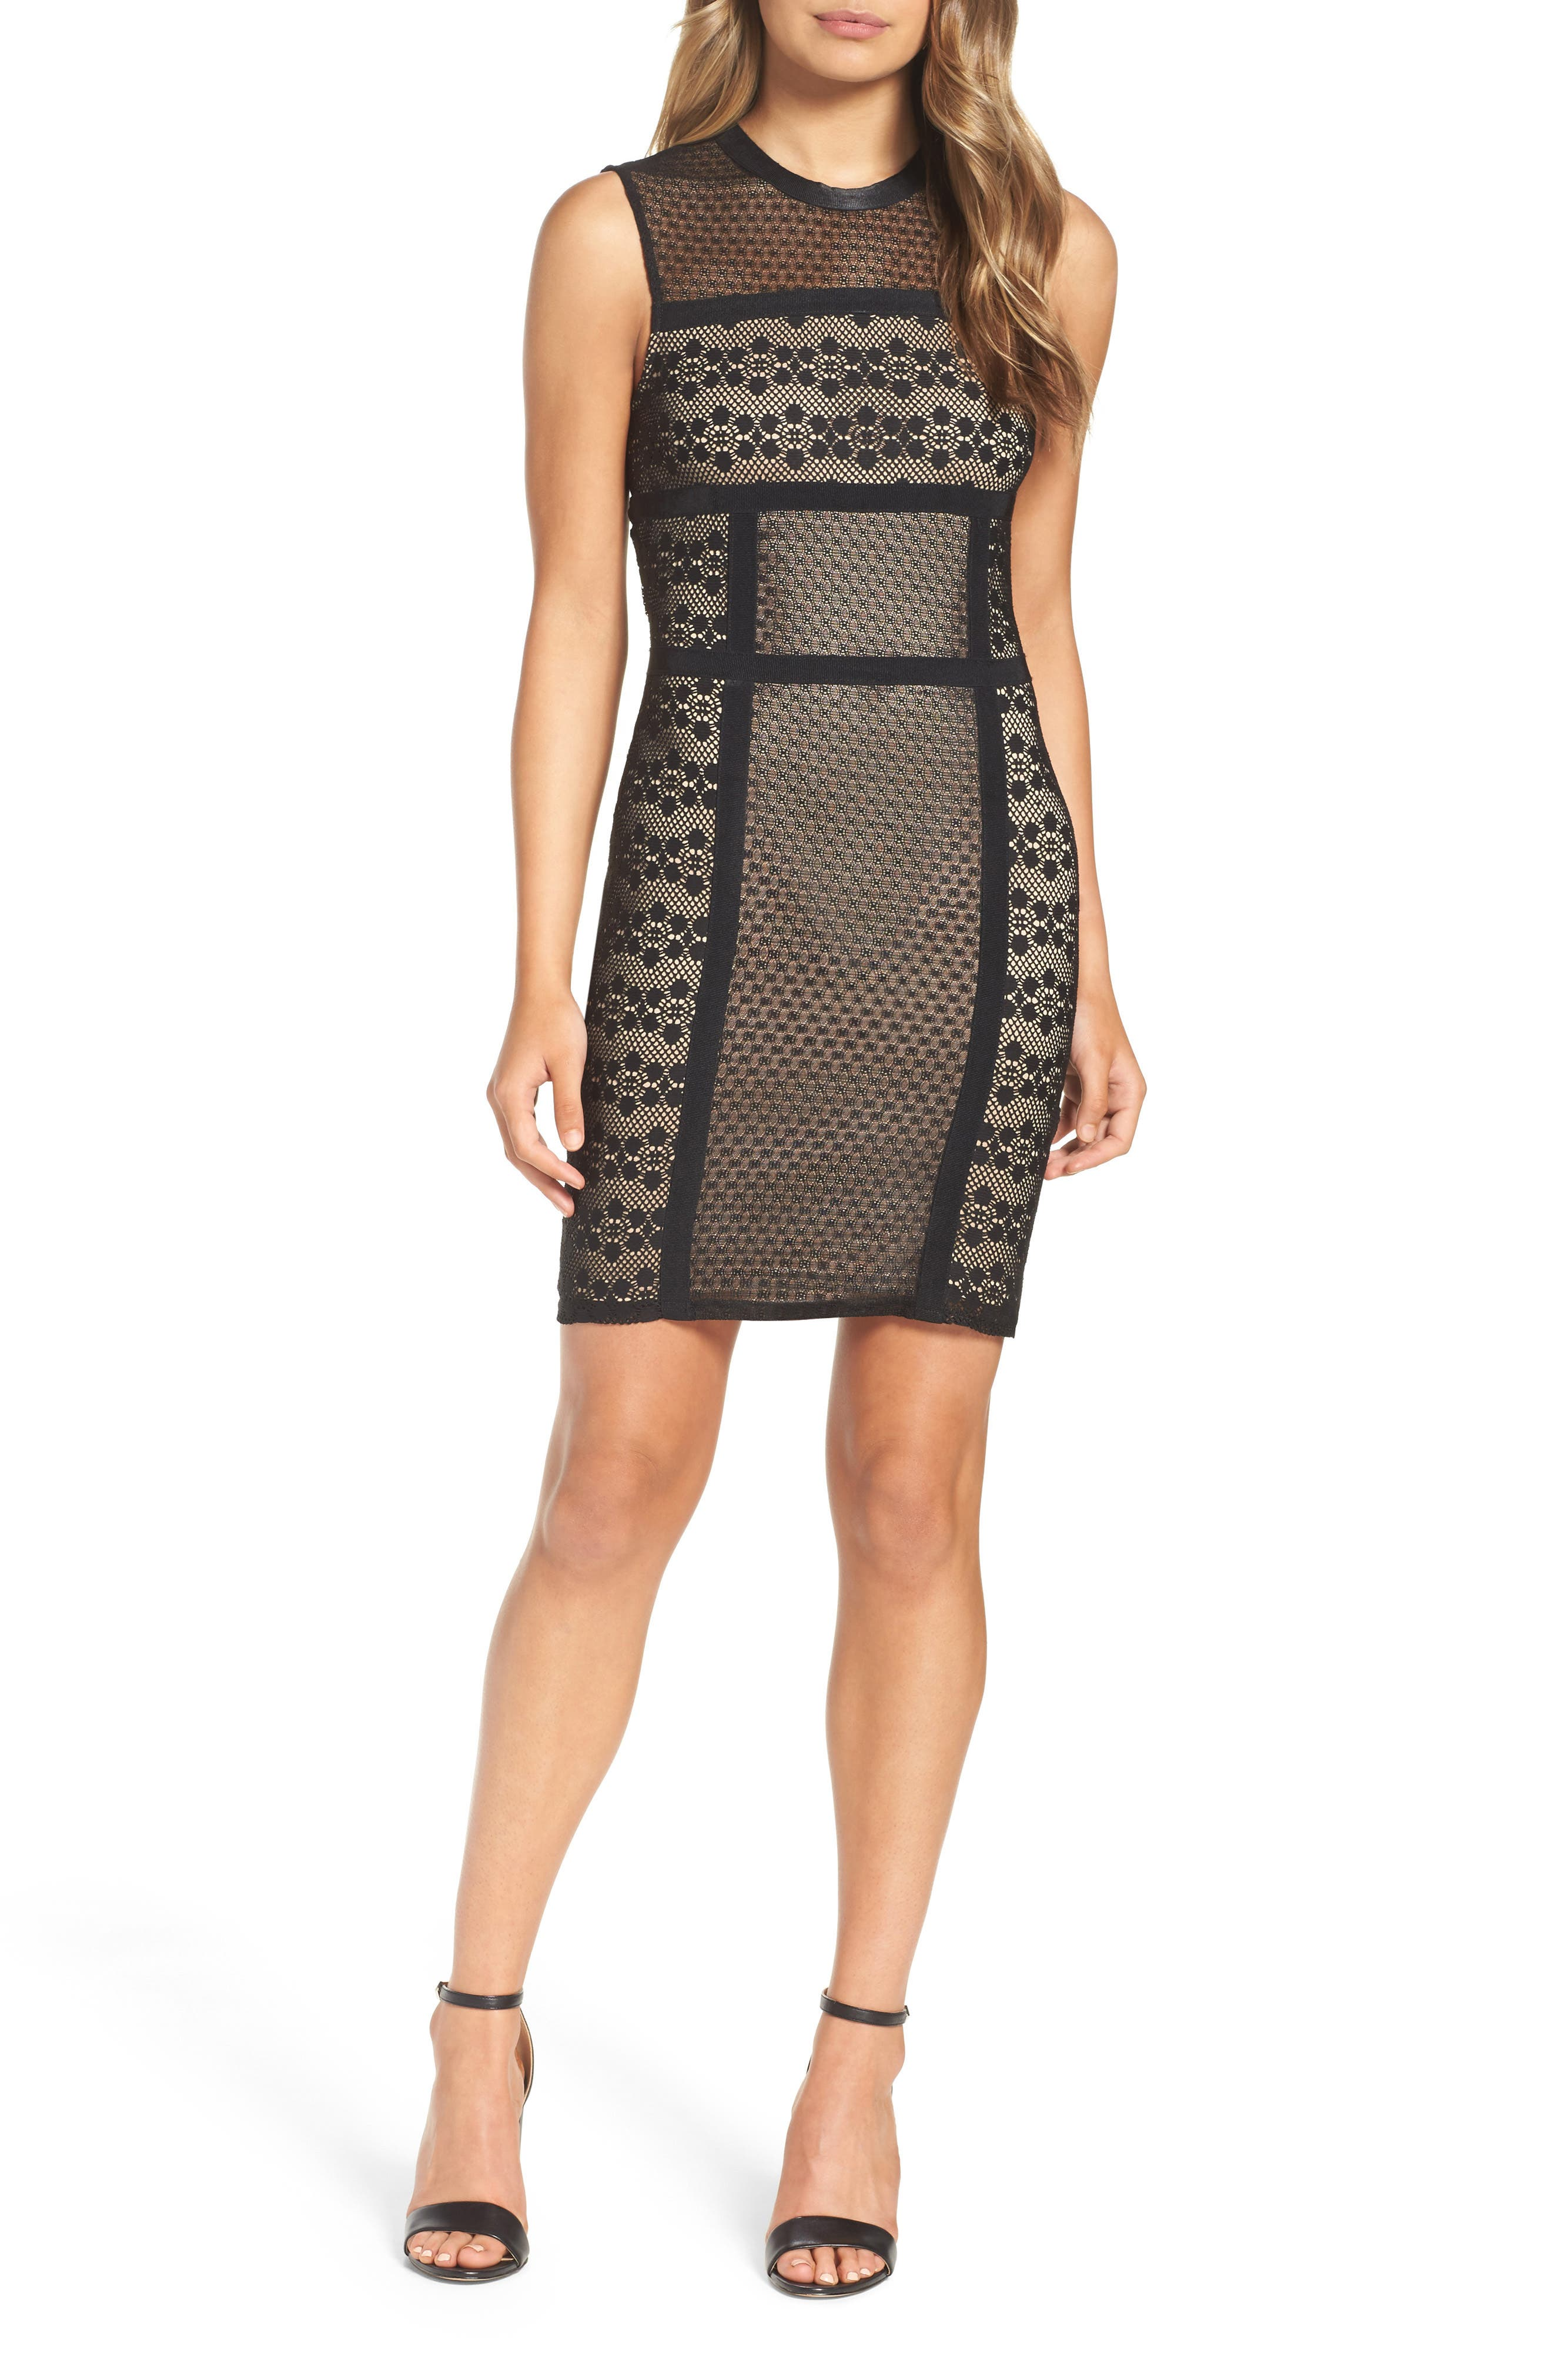 Hola Mamacita Body-Con Dress,                         Main,                         color, 001